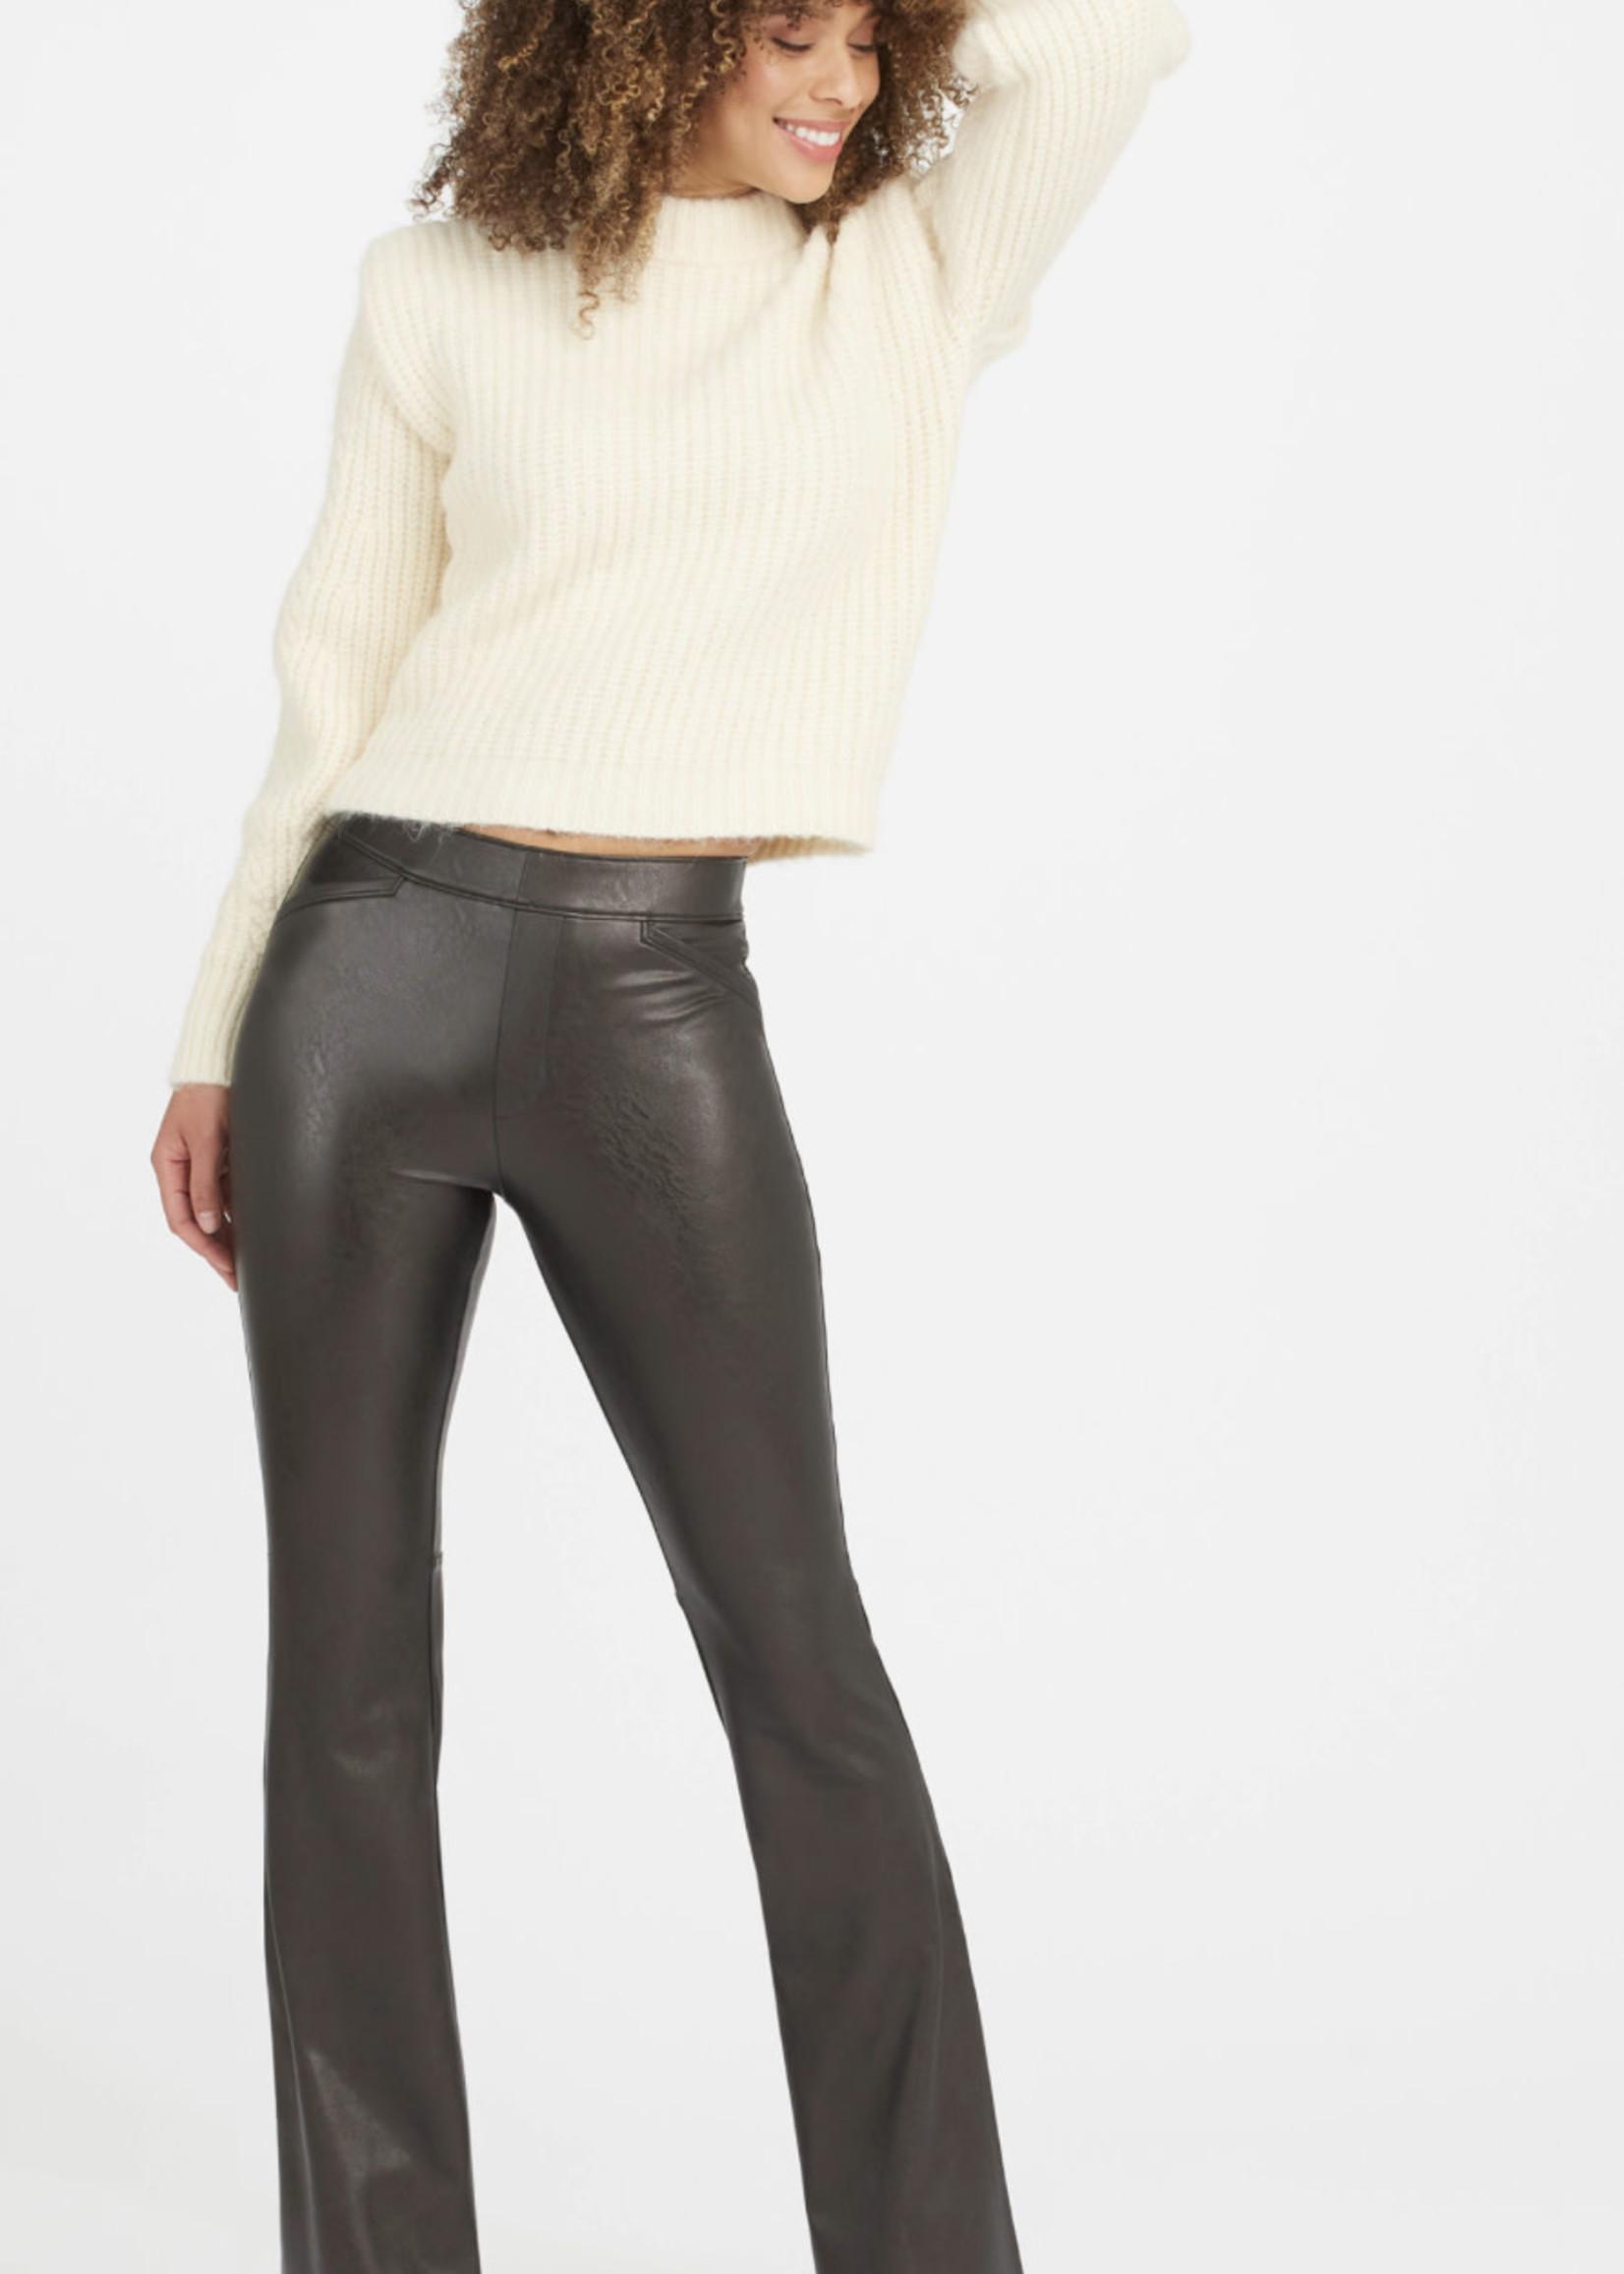 Spanx Leather like Flare Pant